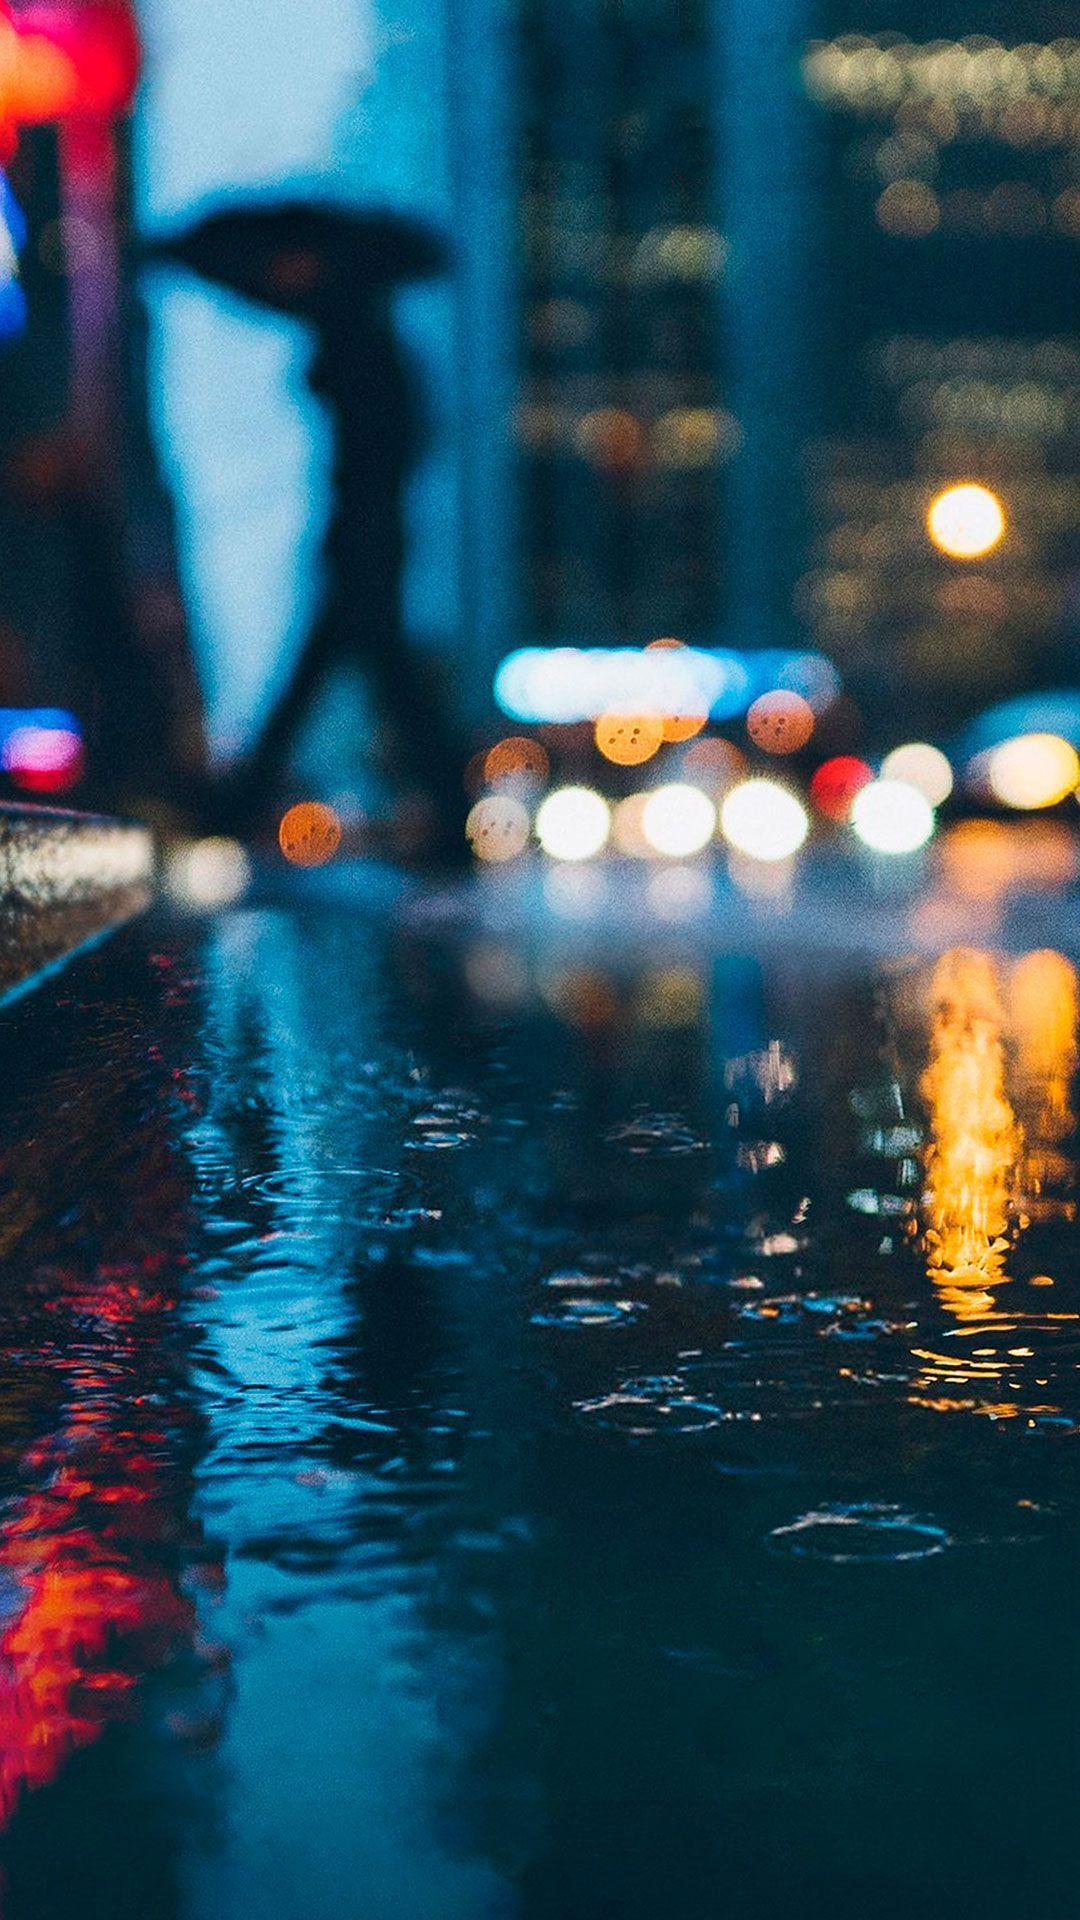 Rain iPhone Wallpapers - Top Free Rain ...